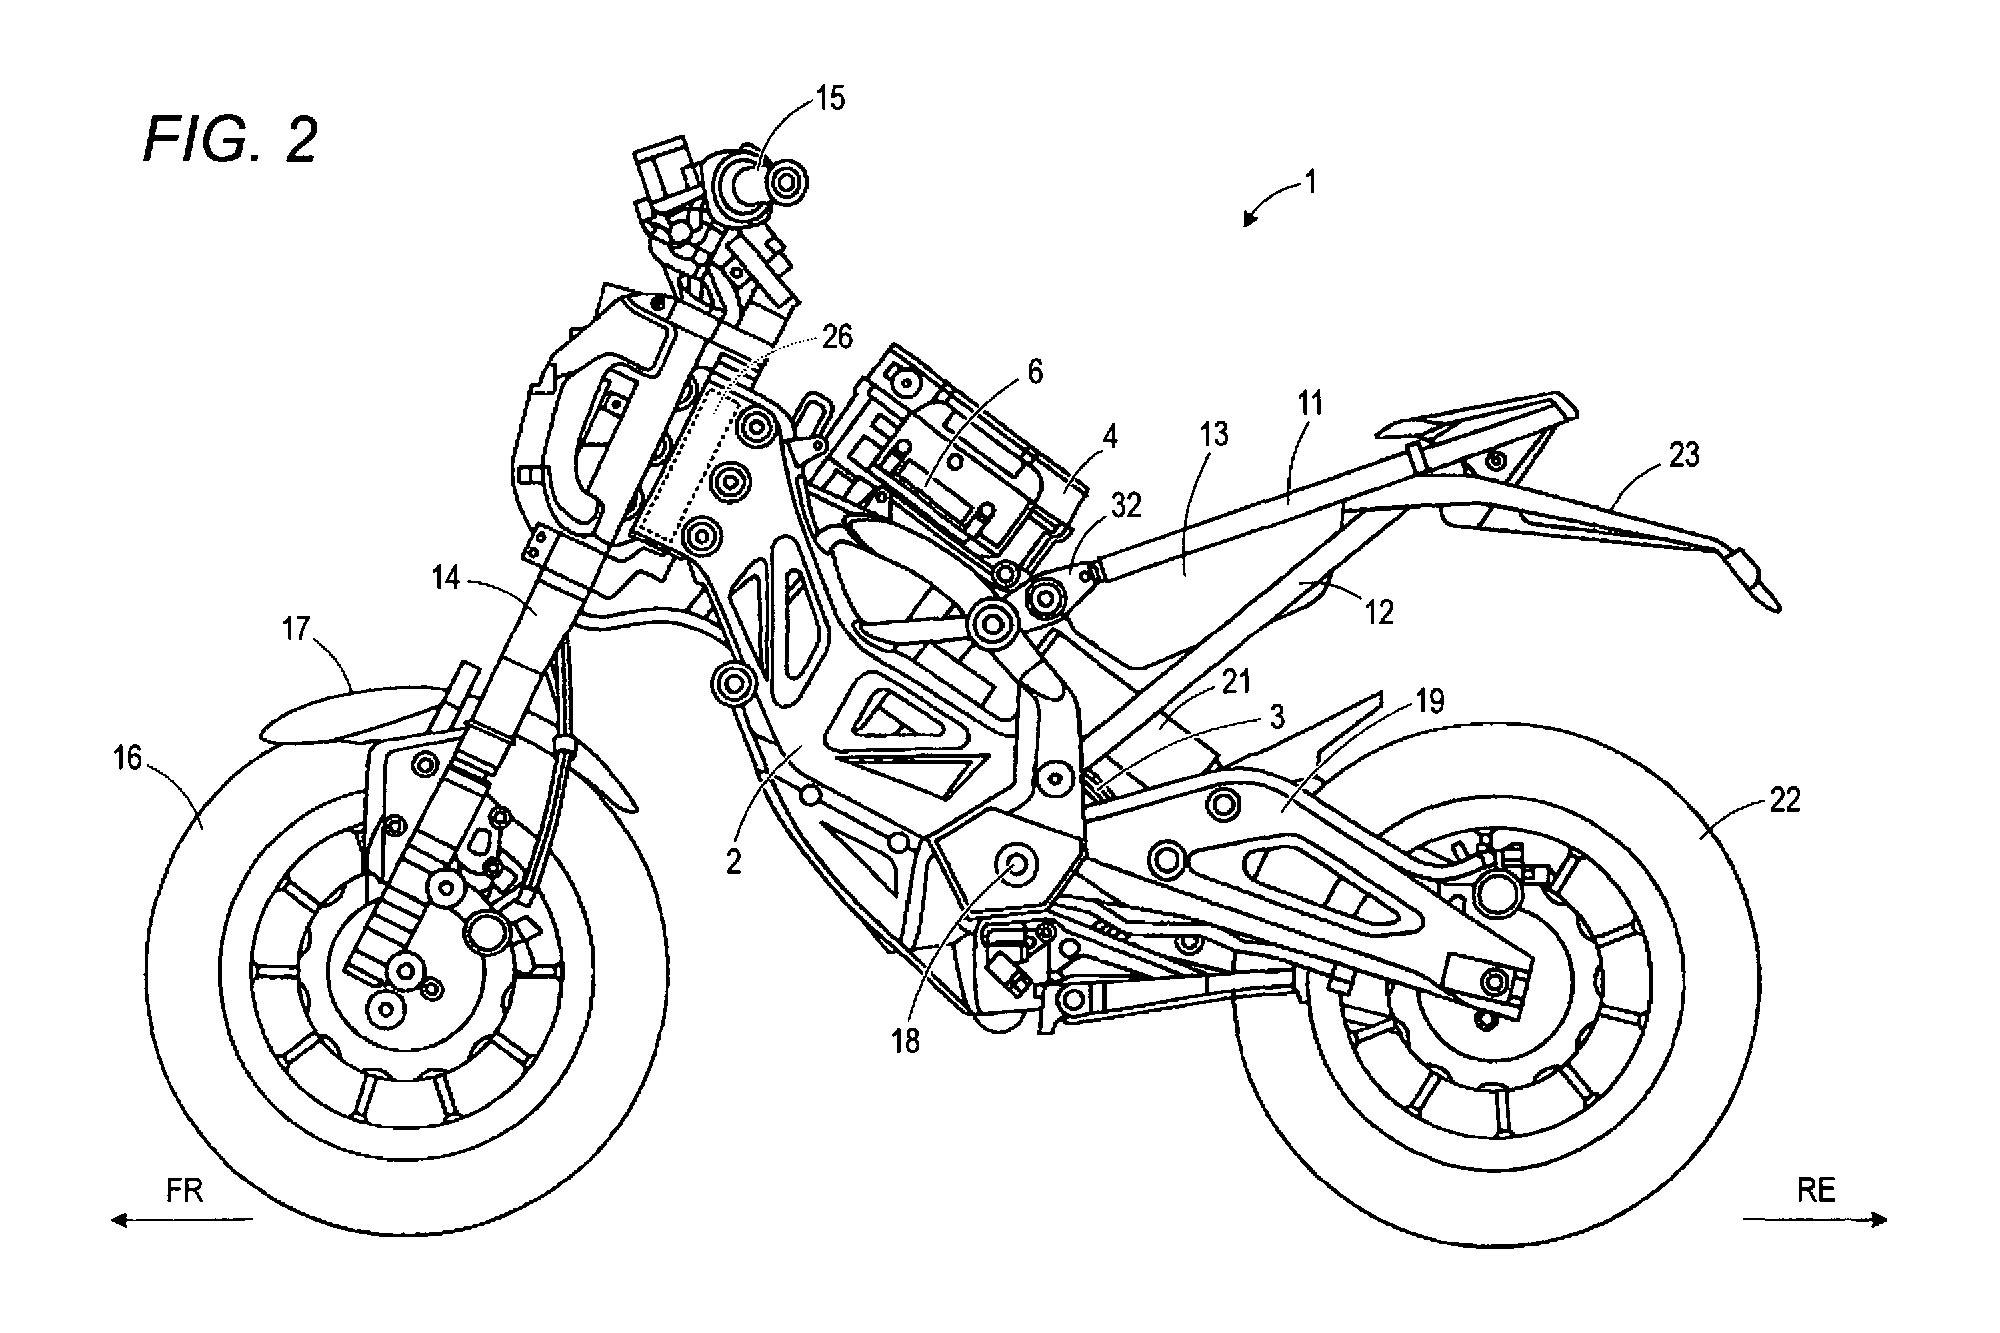 Suzuki Extrigger Coming To Market